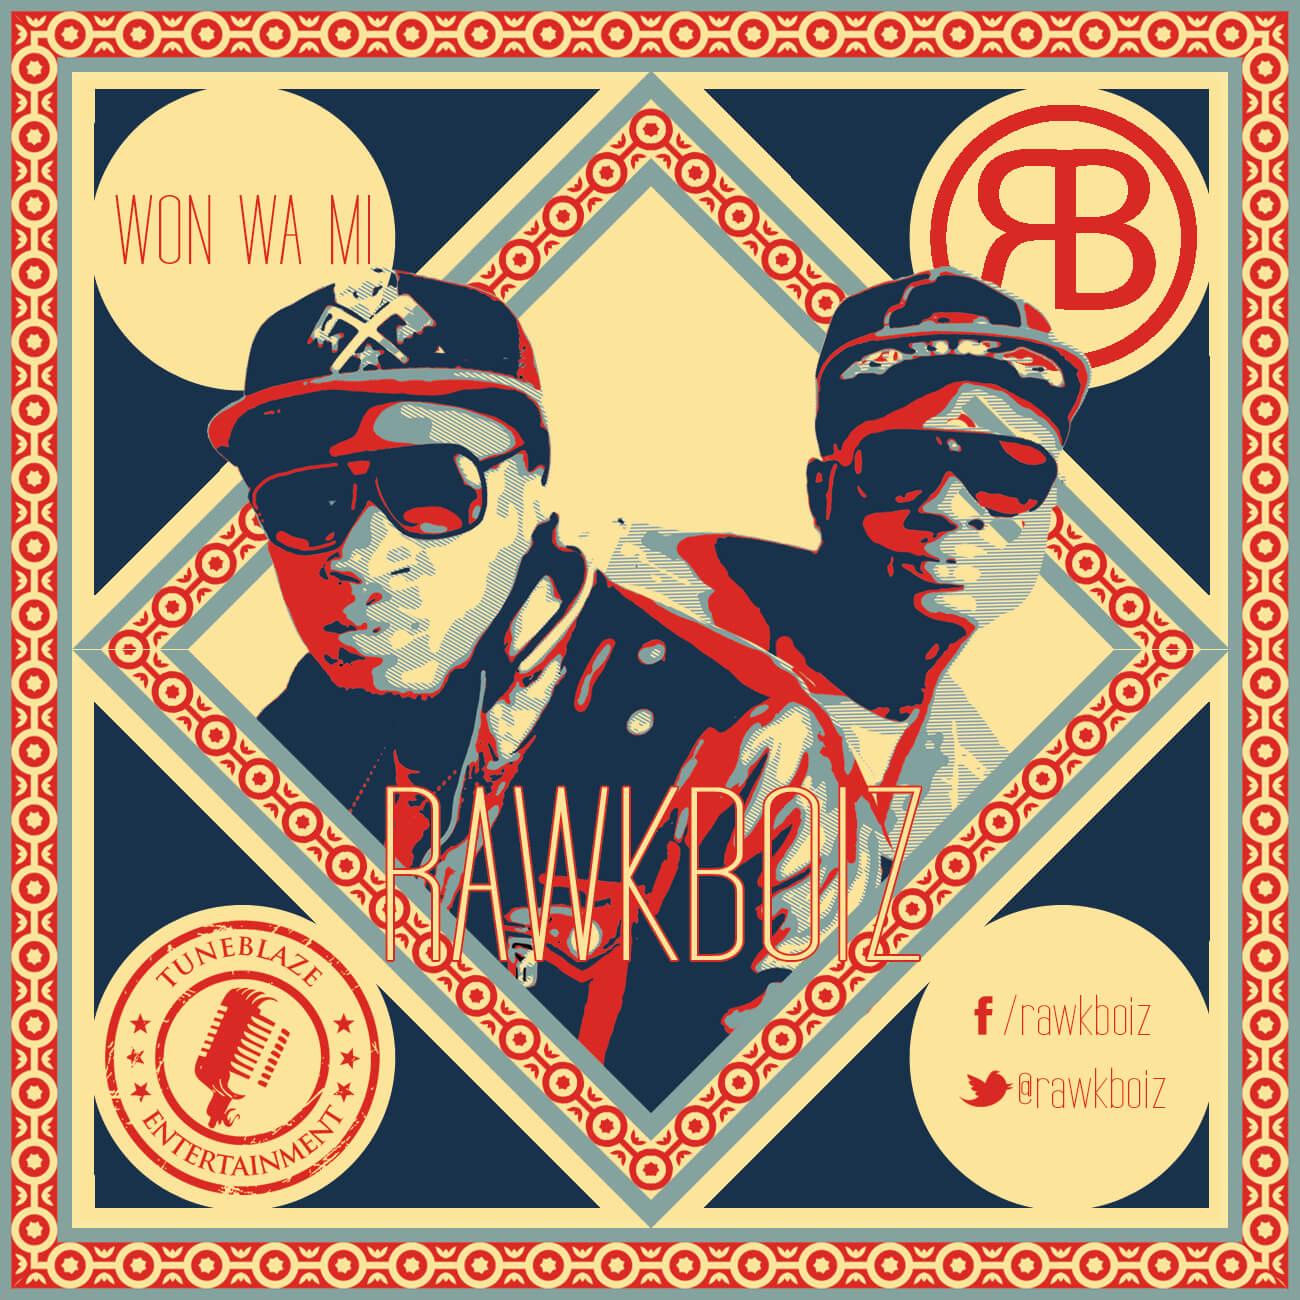 RawkBoiz Cover